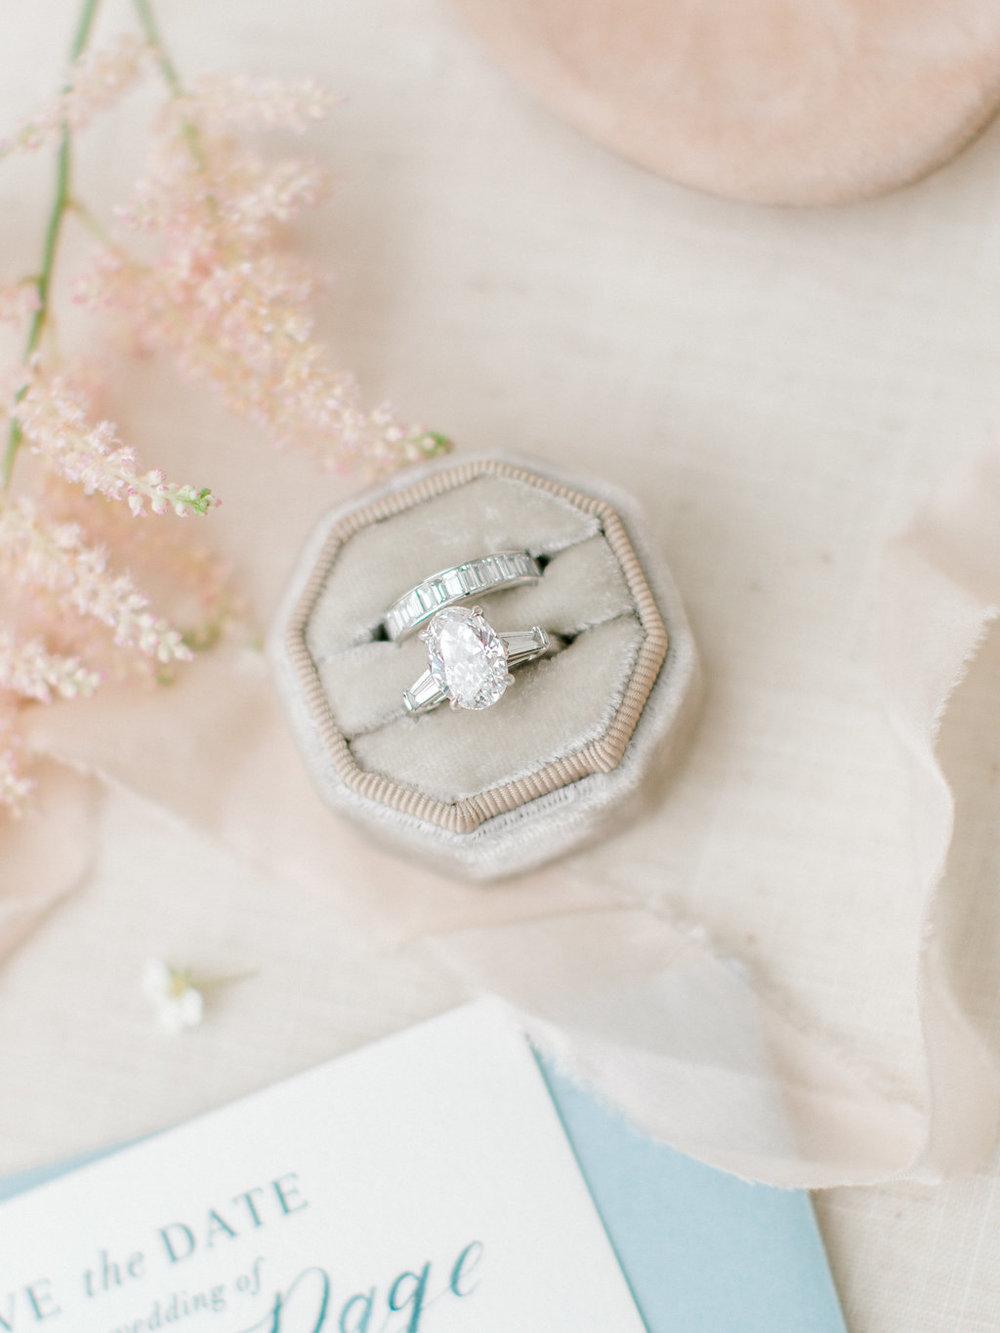 Coffman+Wedding+Details-5.jpg